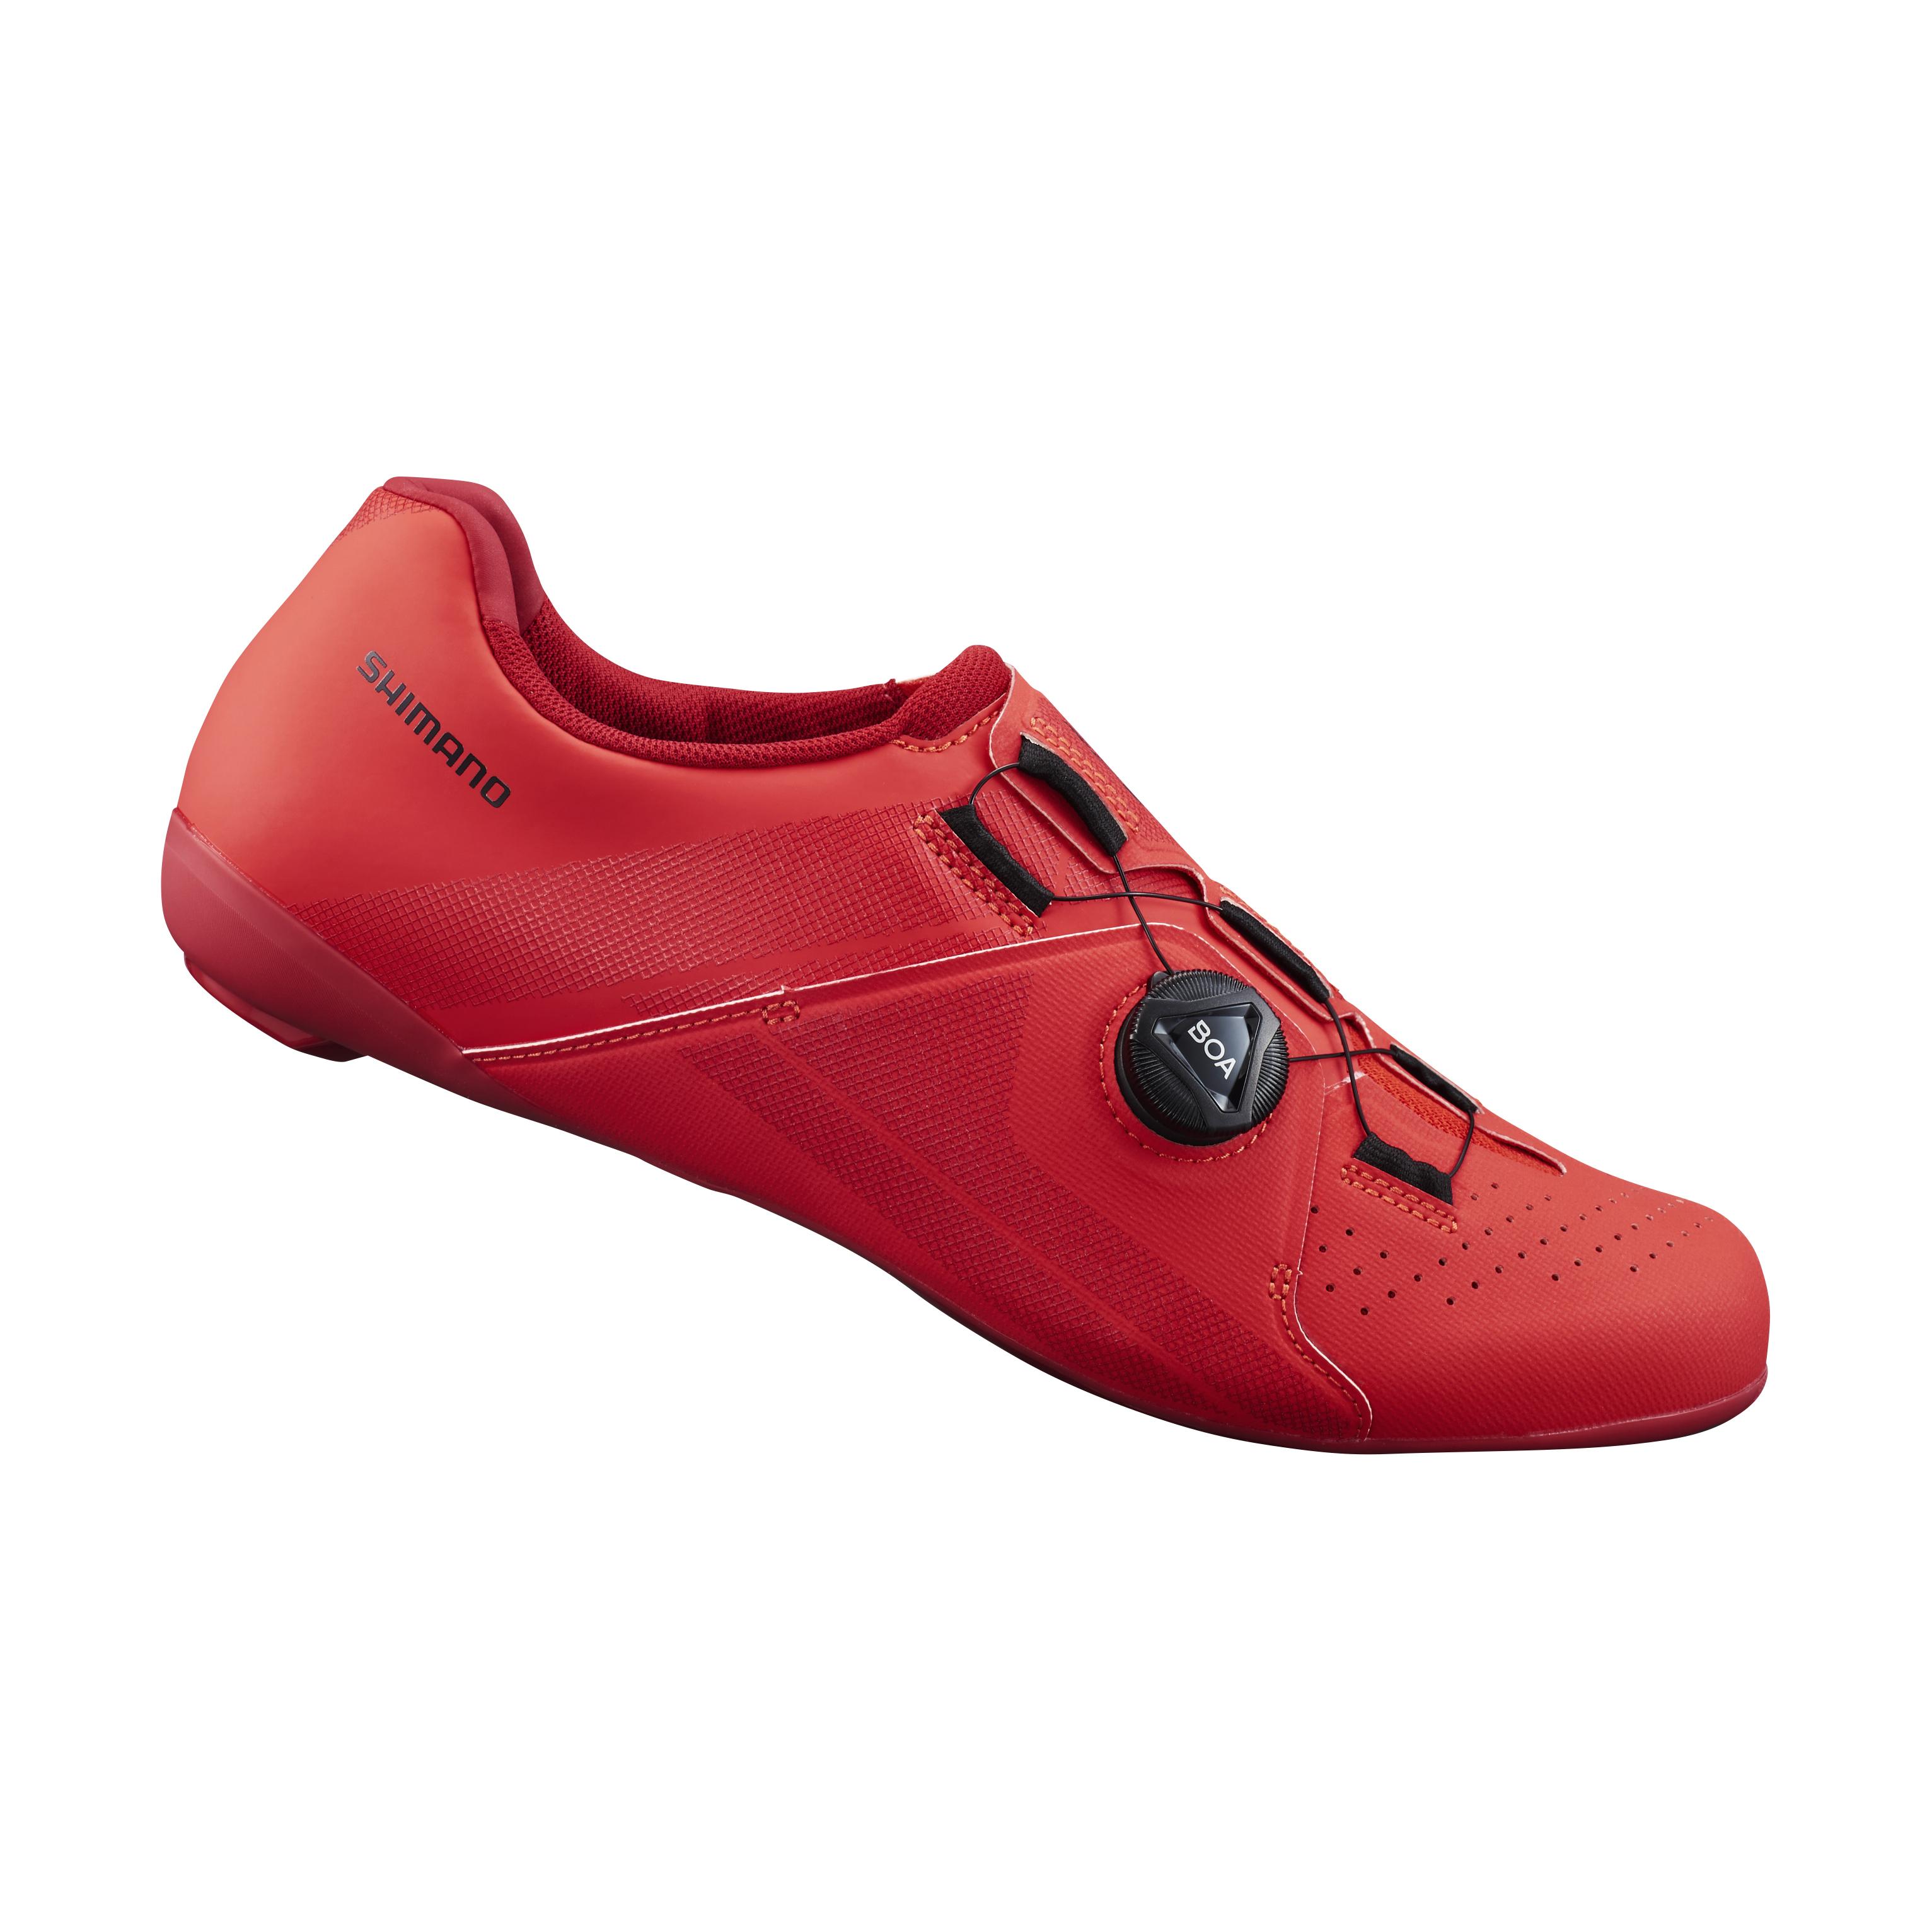 SHIMANO silniční obuv SH-RC300ML, červená, 41